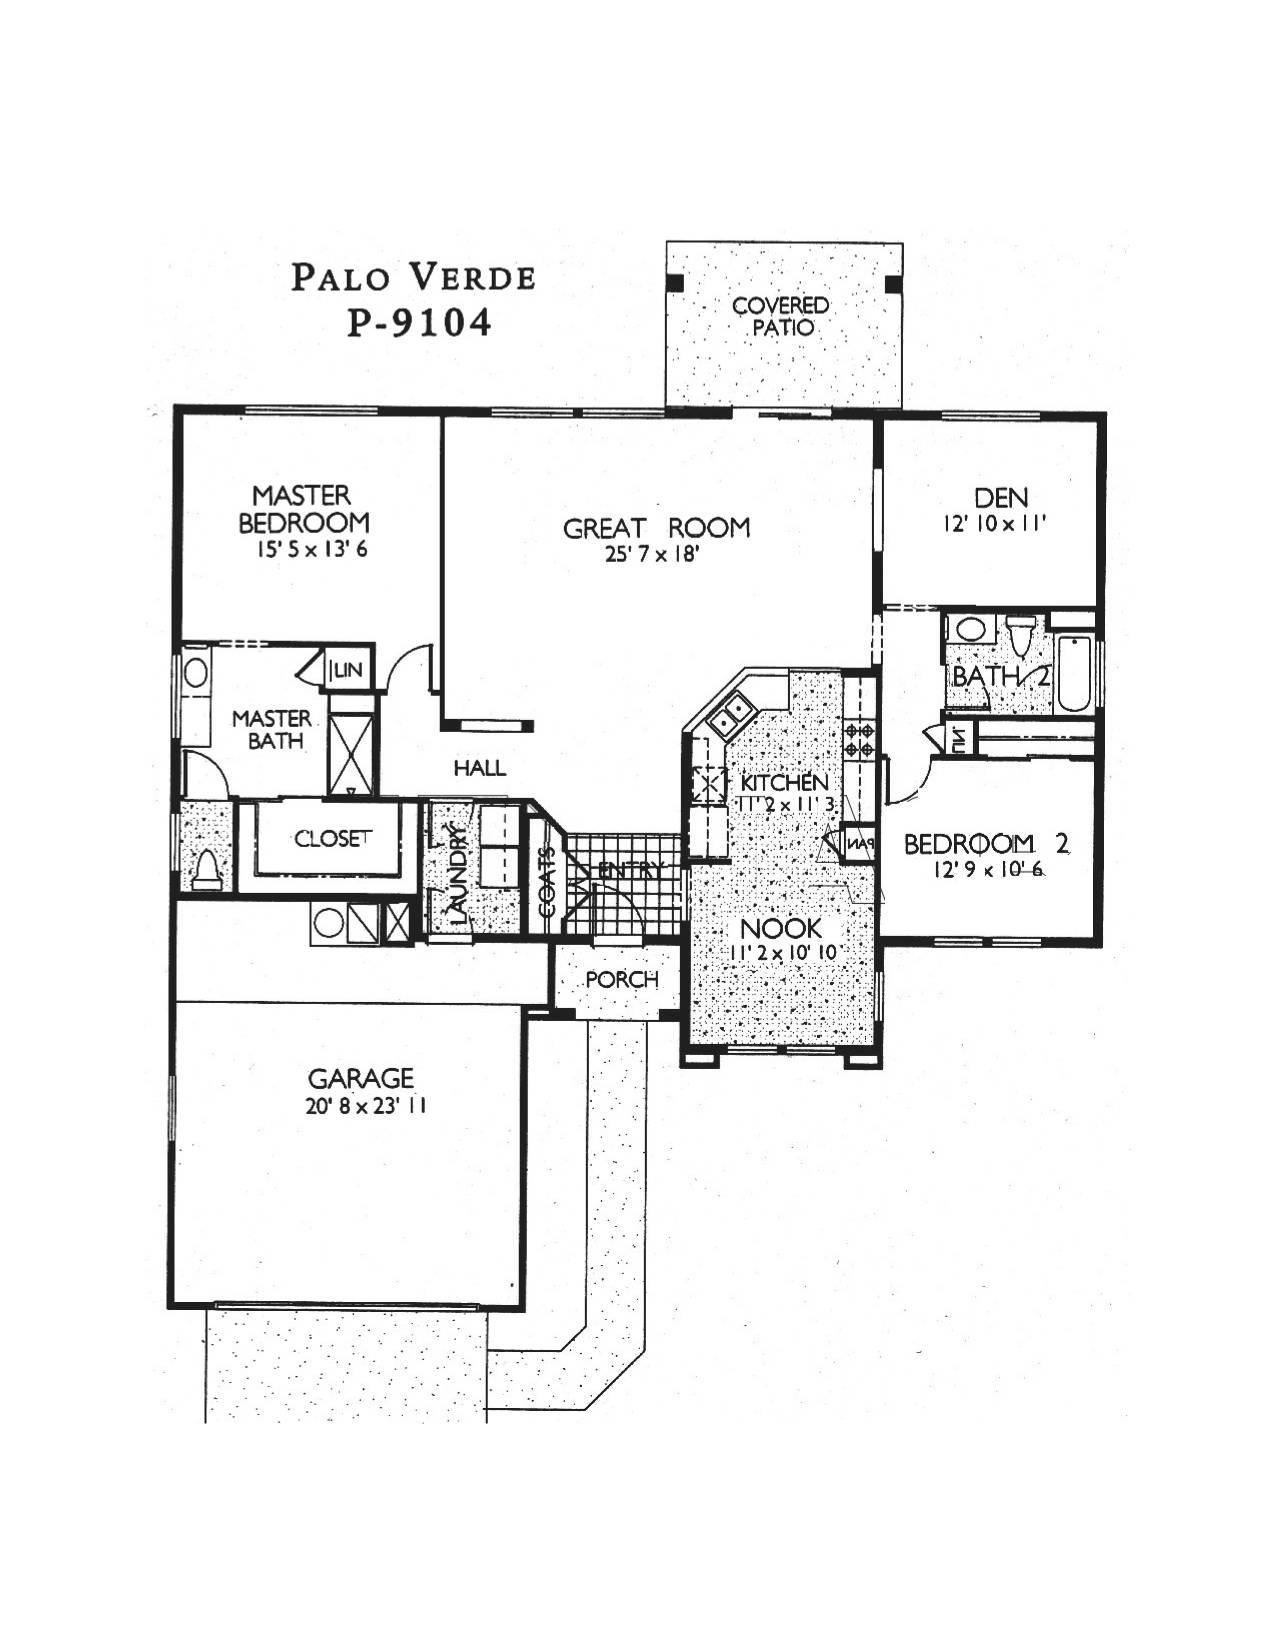 Sun city grand palo verde 15842 w kino dr surprise 8537 for Palo verde homes floor plans